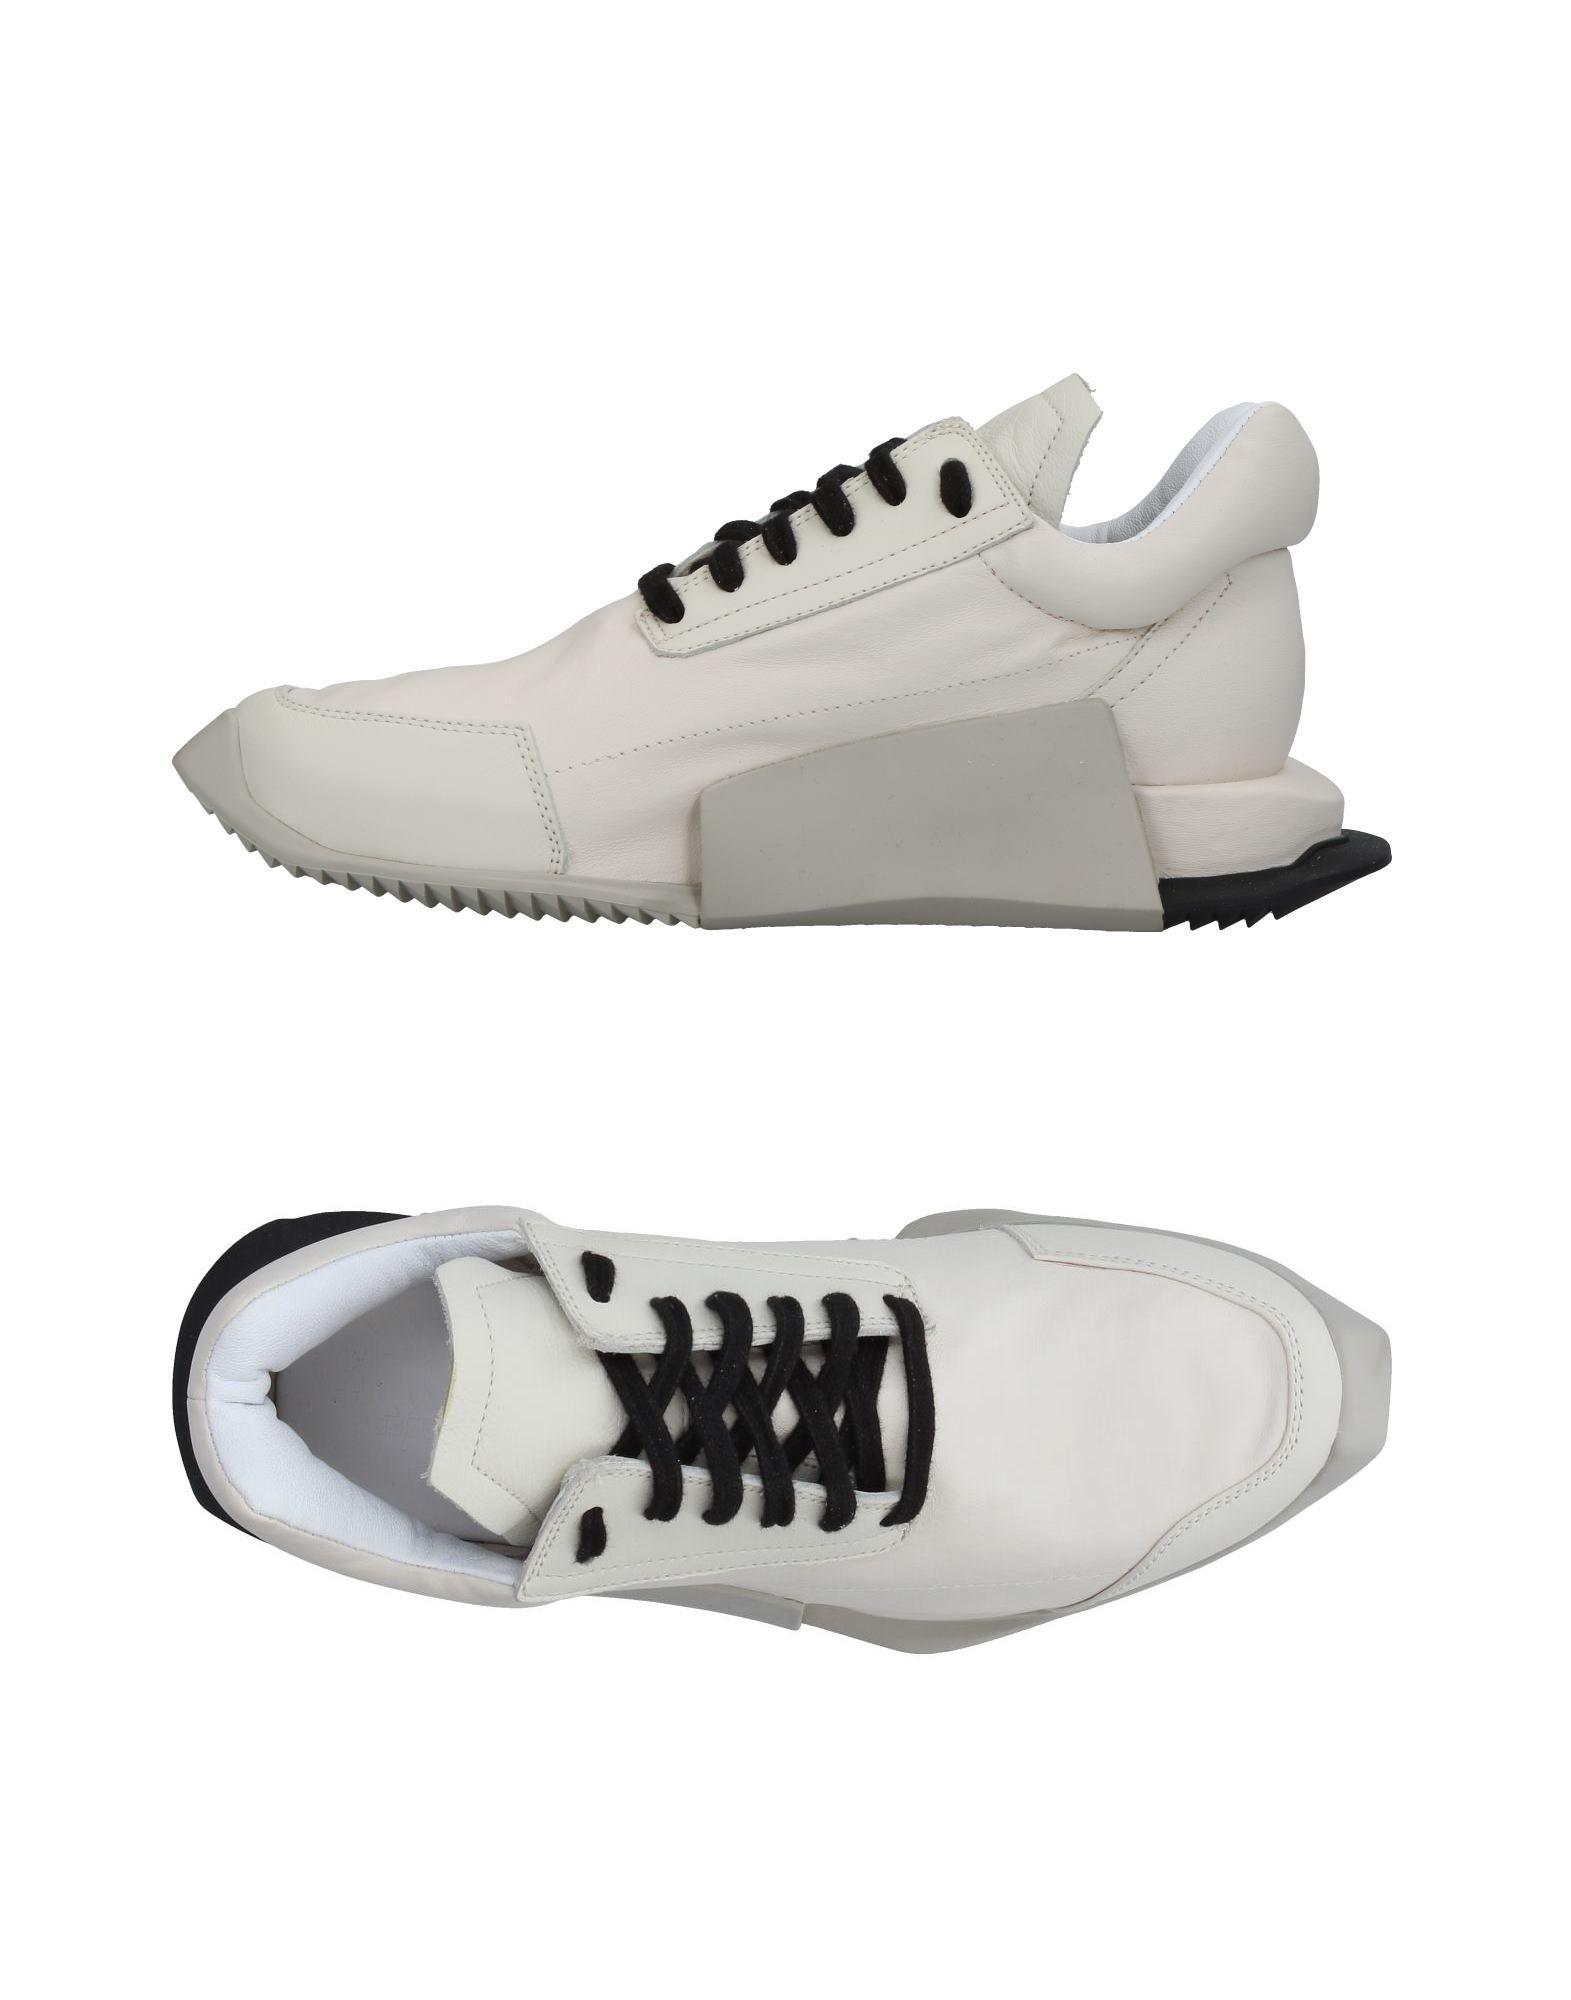 Rick Owens X Adidas Sneakers Herren  11370941IS Gute Qualität beliebte Schuhe